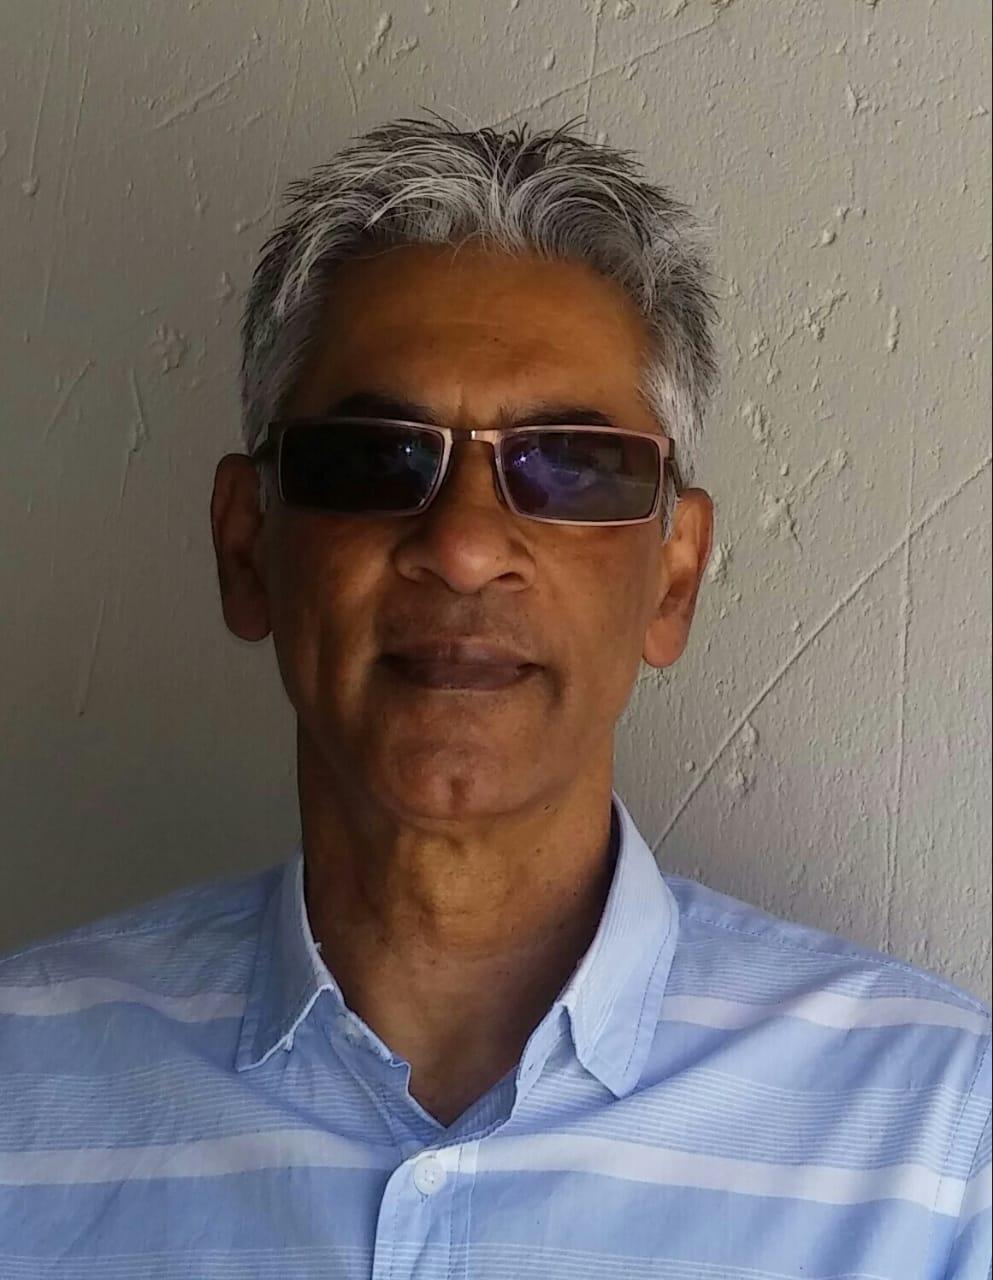 Reuben Munsamy